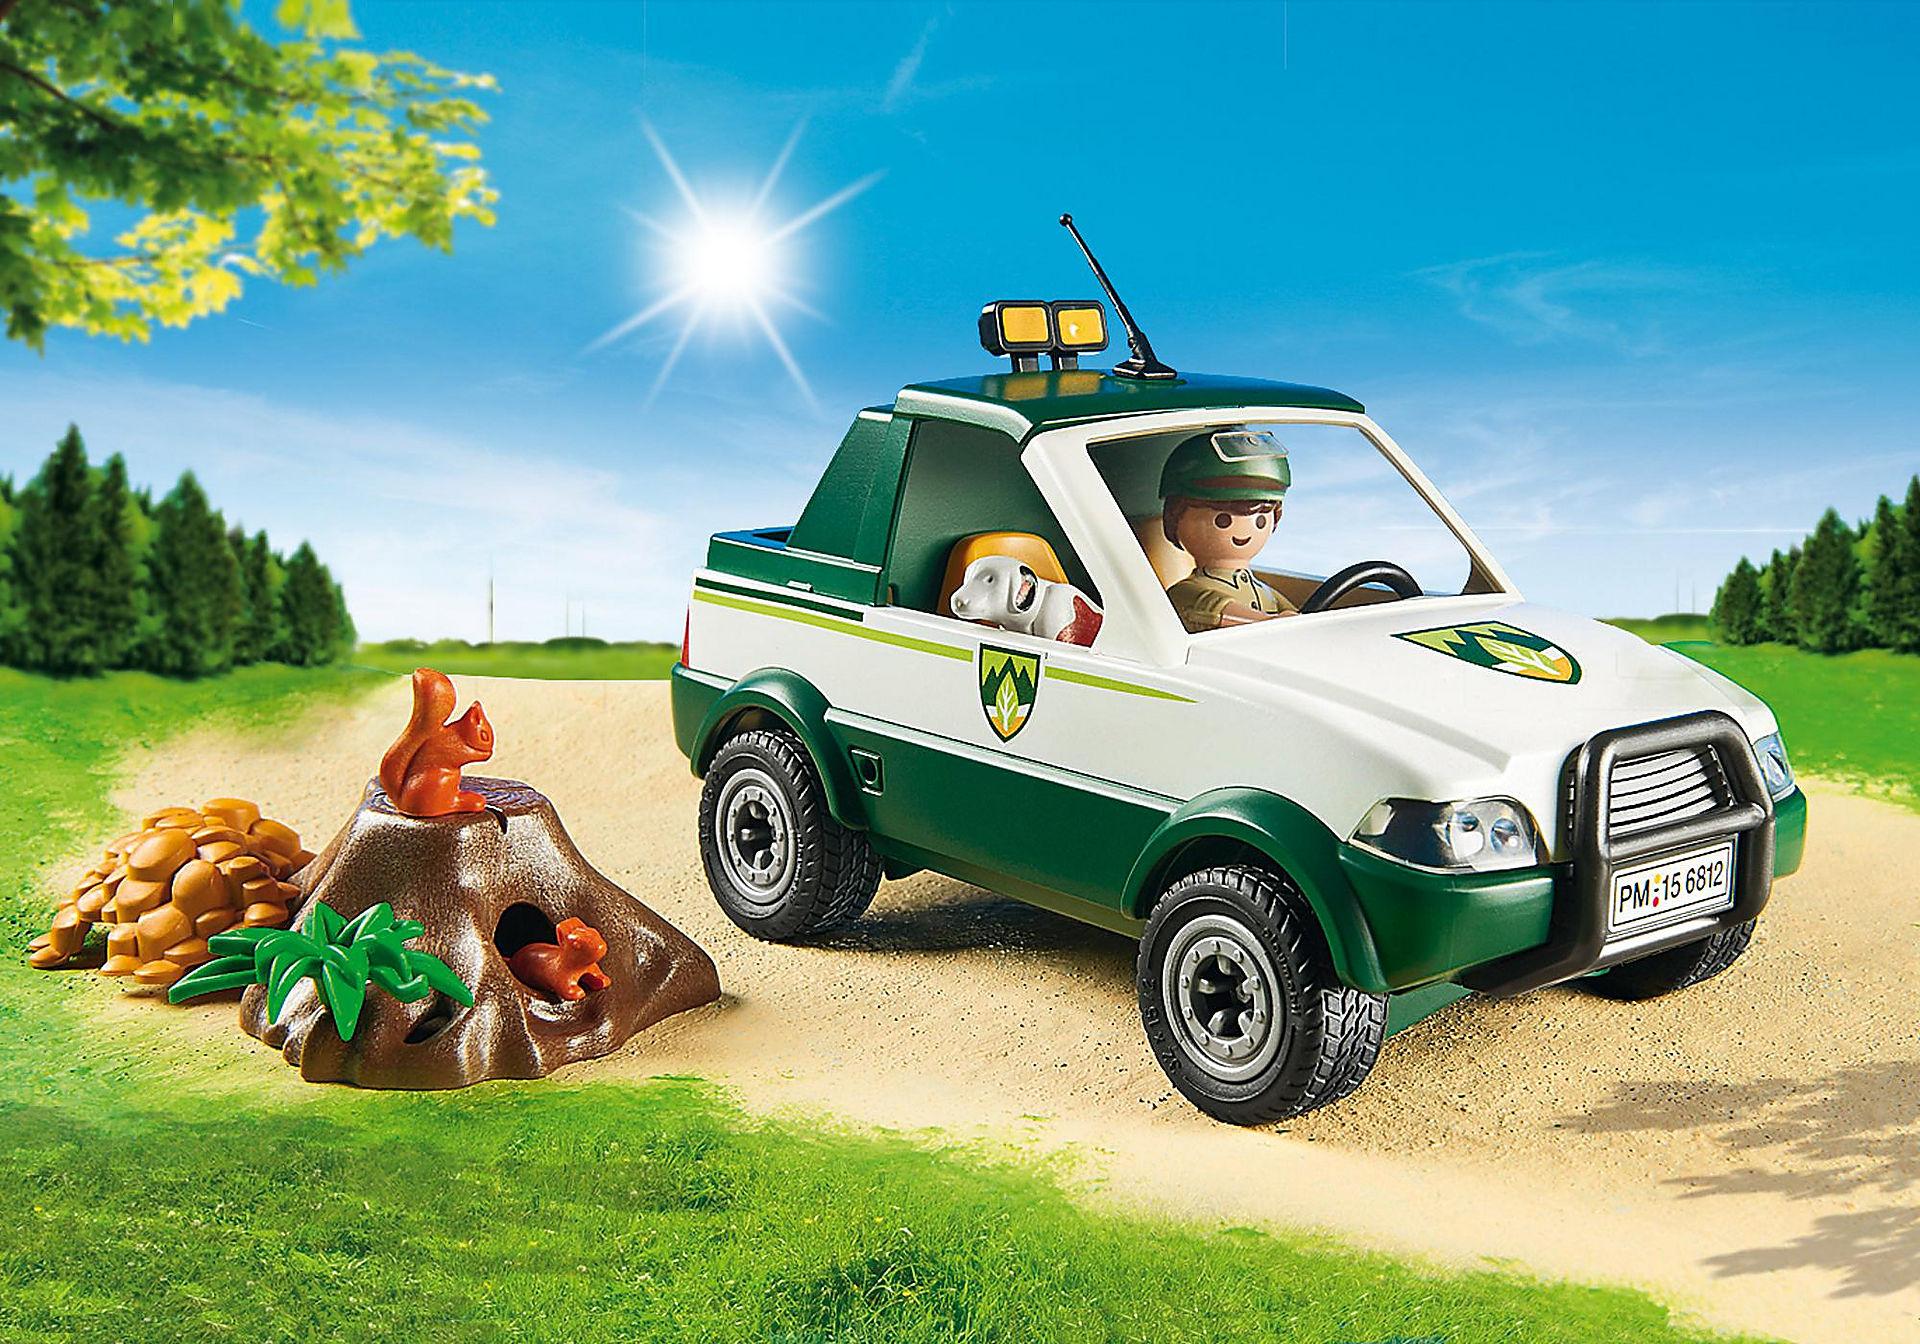 http://media.playmobil.com/i/playmobil/6812_product_extra2/Garde forestier avec pick-up